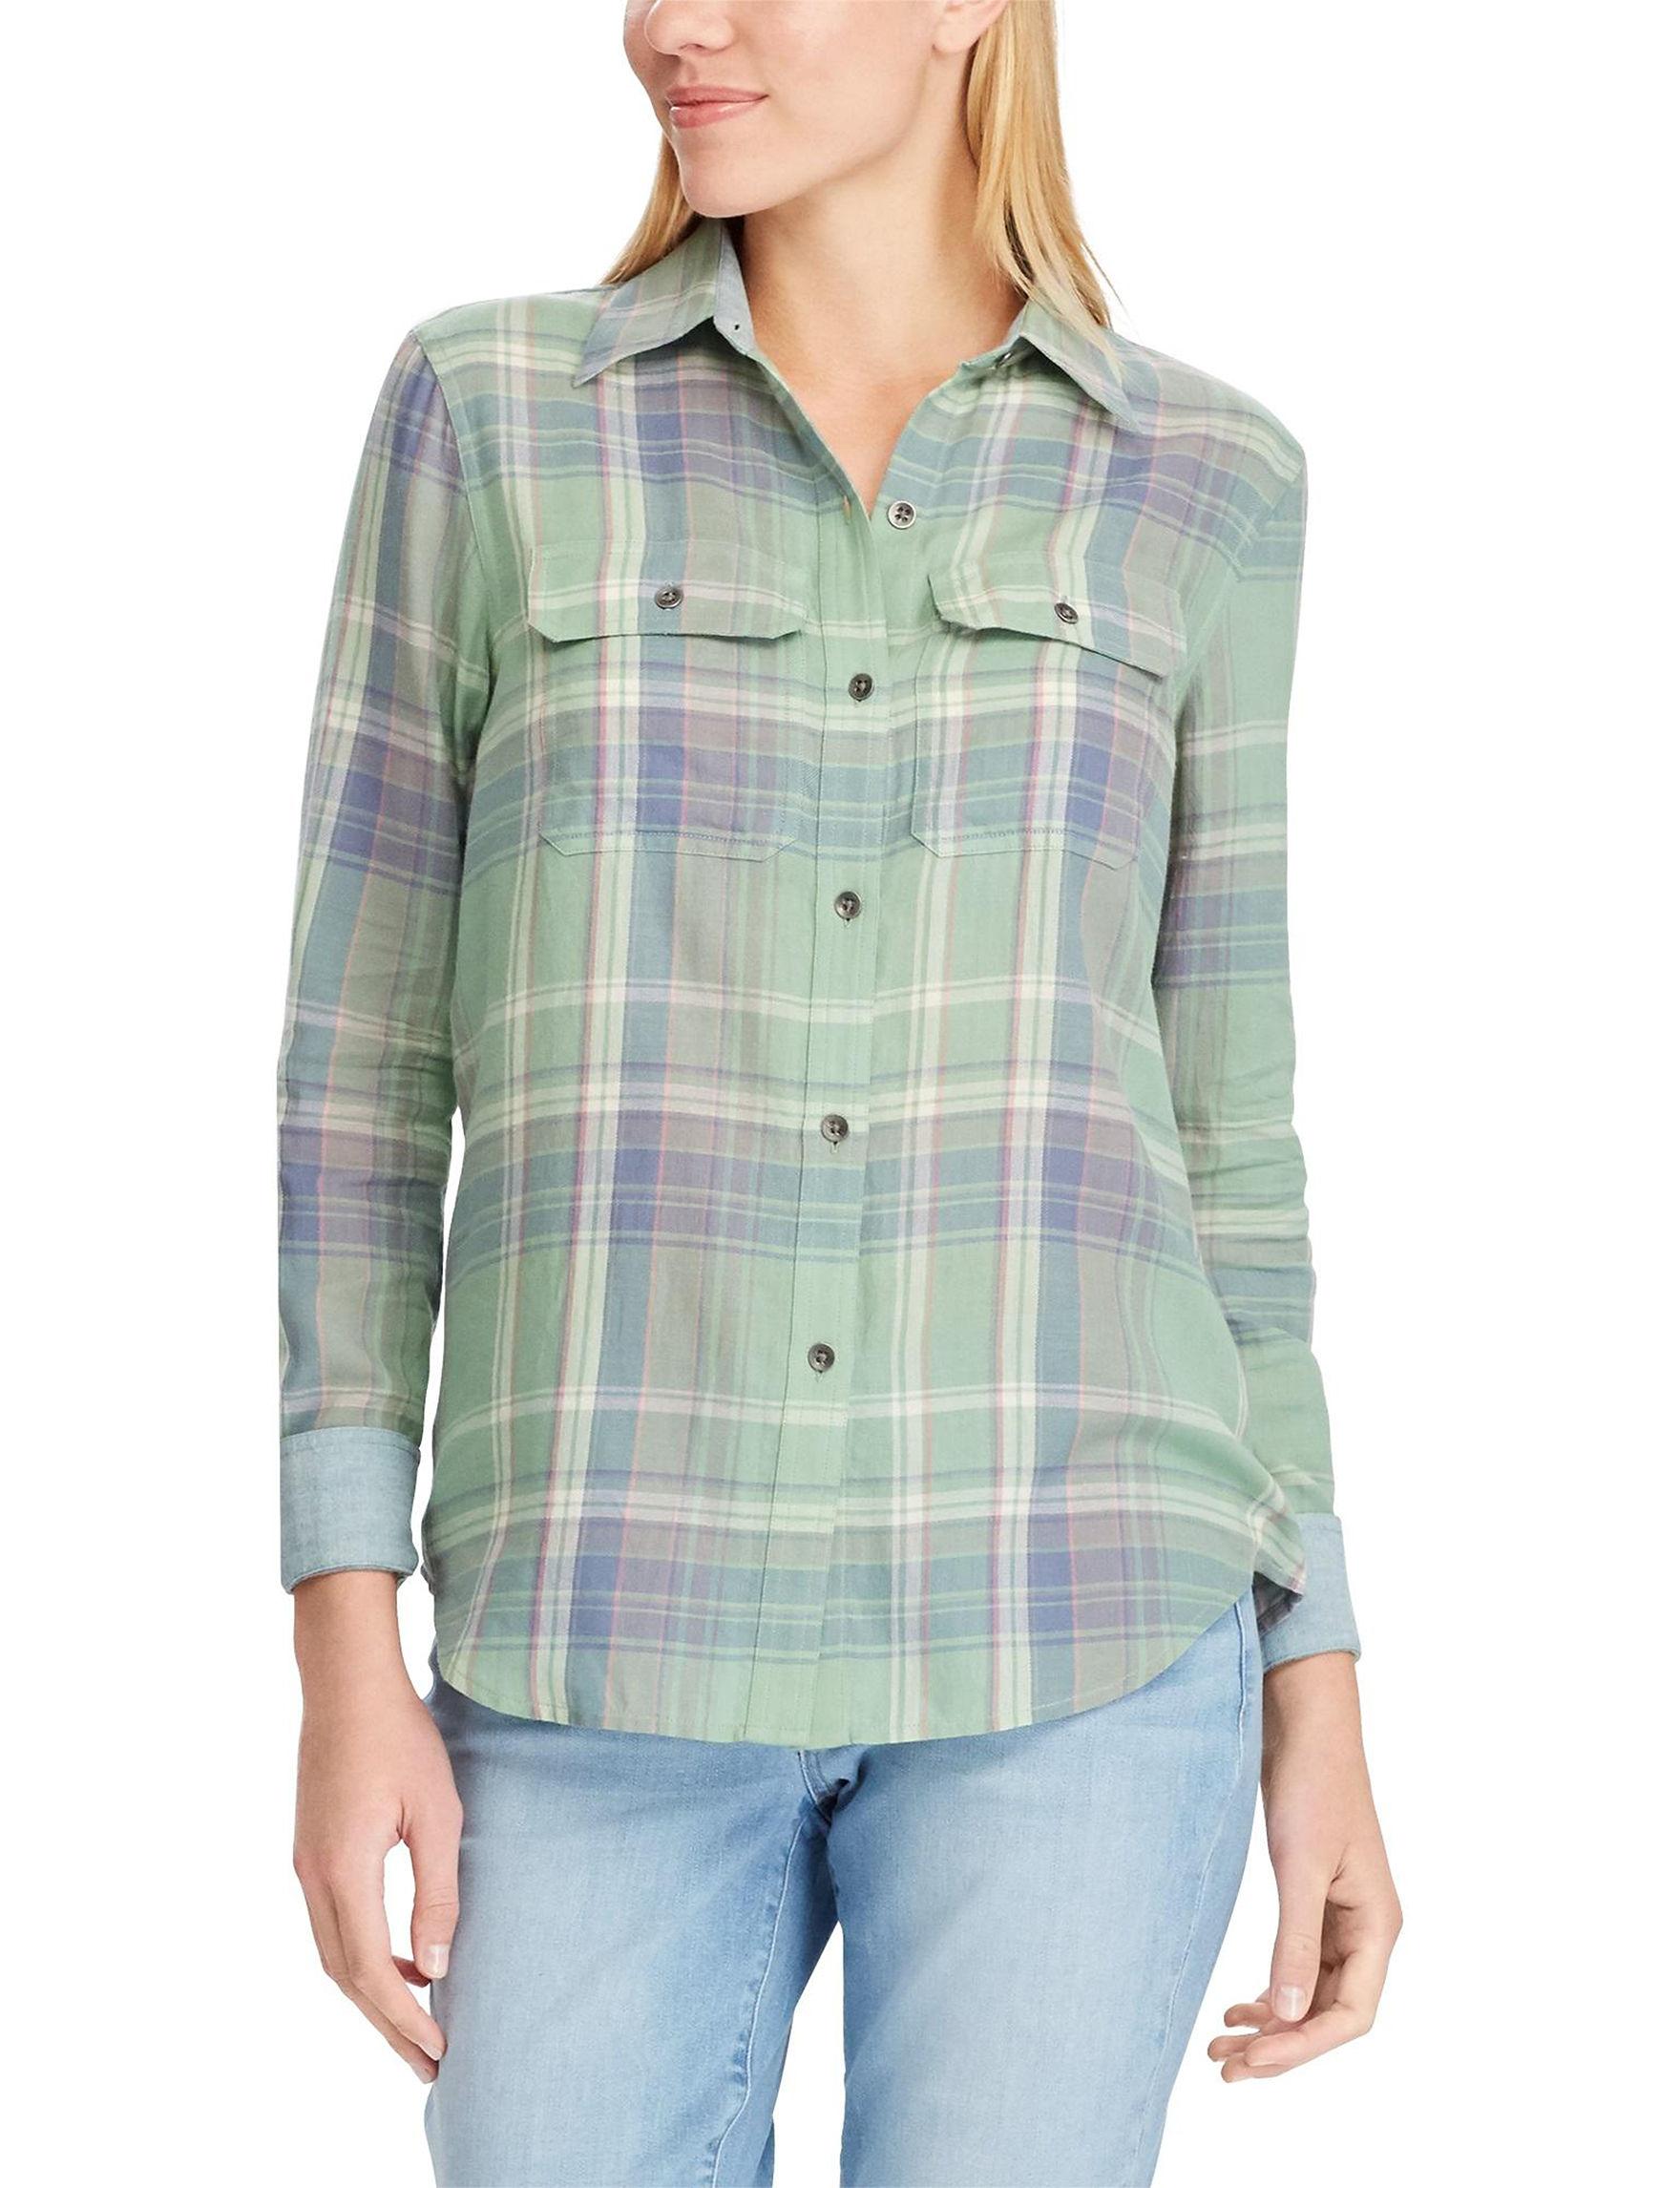 Chaps Green Plaid Shirts & Blouses